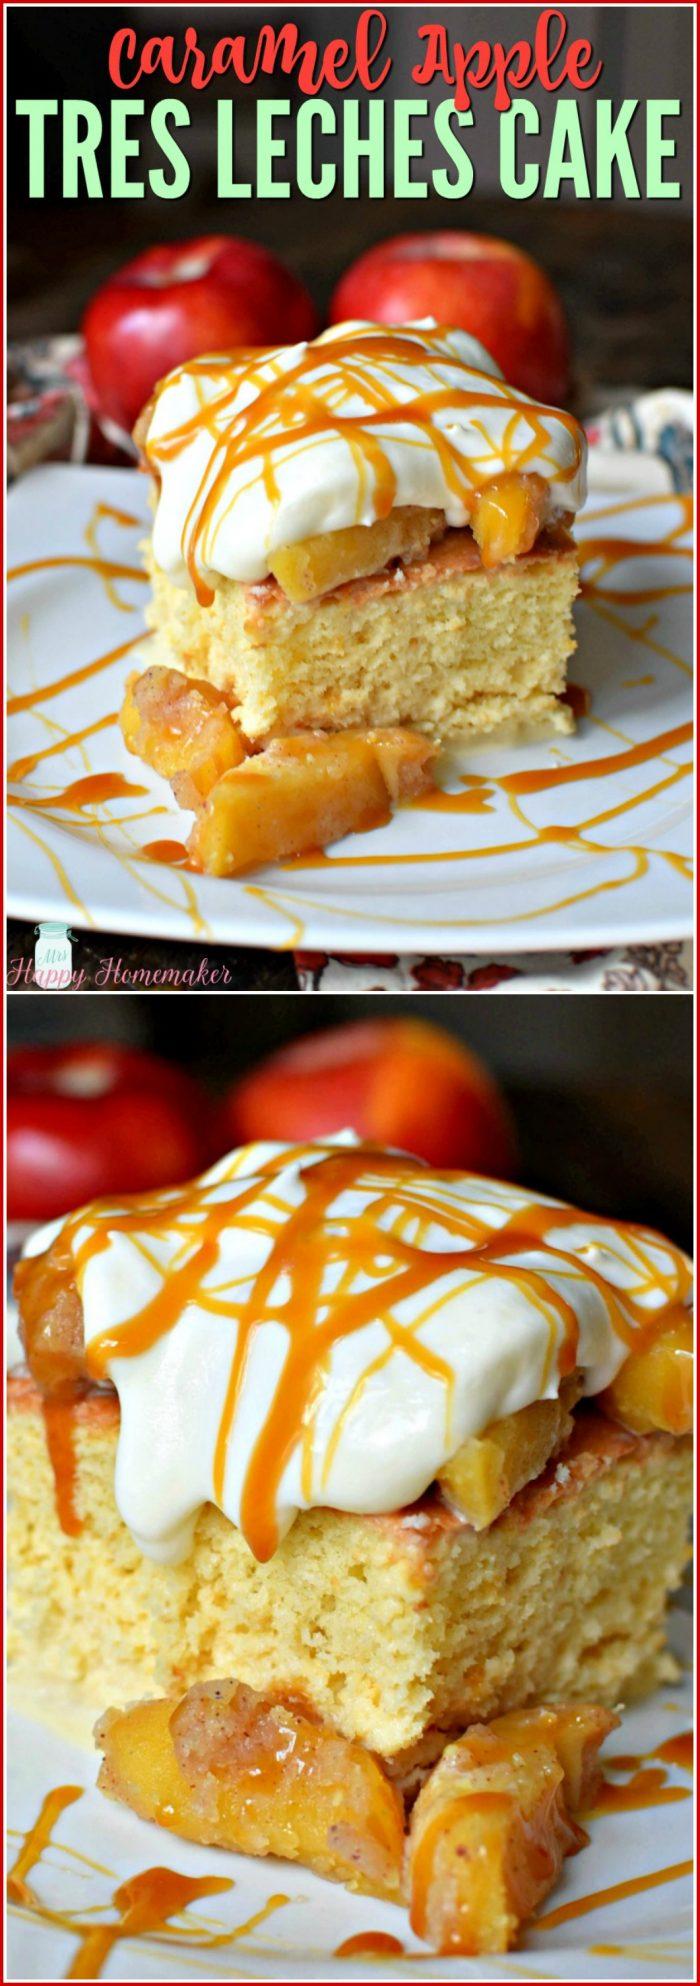 Caramel Apple Tres Leches Cake | MrsHappyHomemaker.com